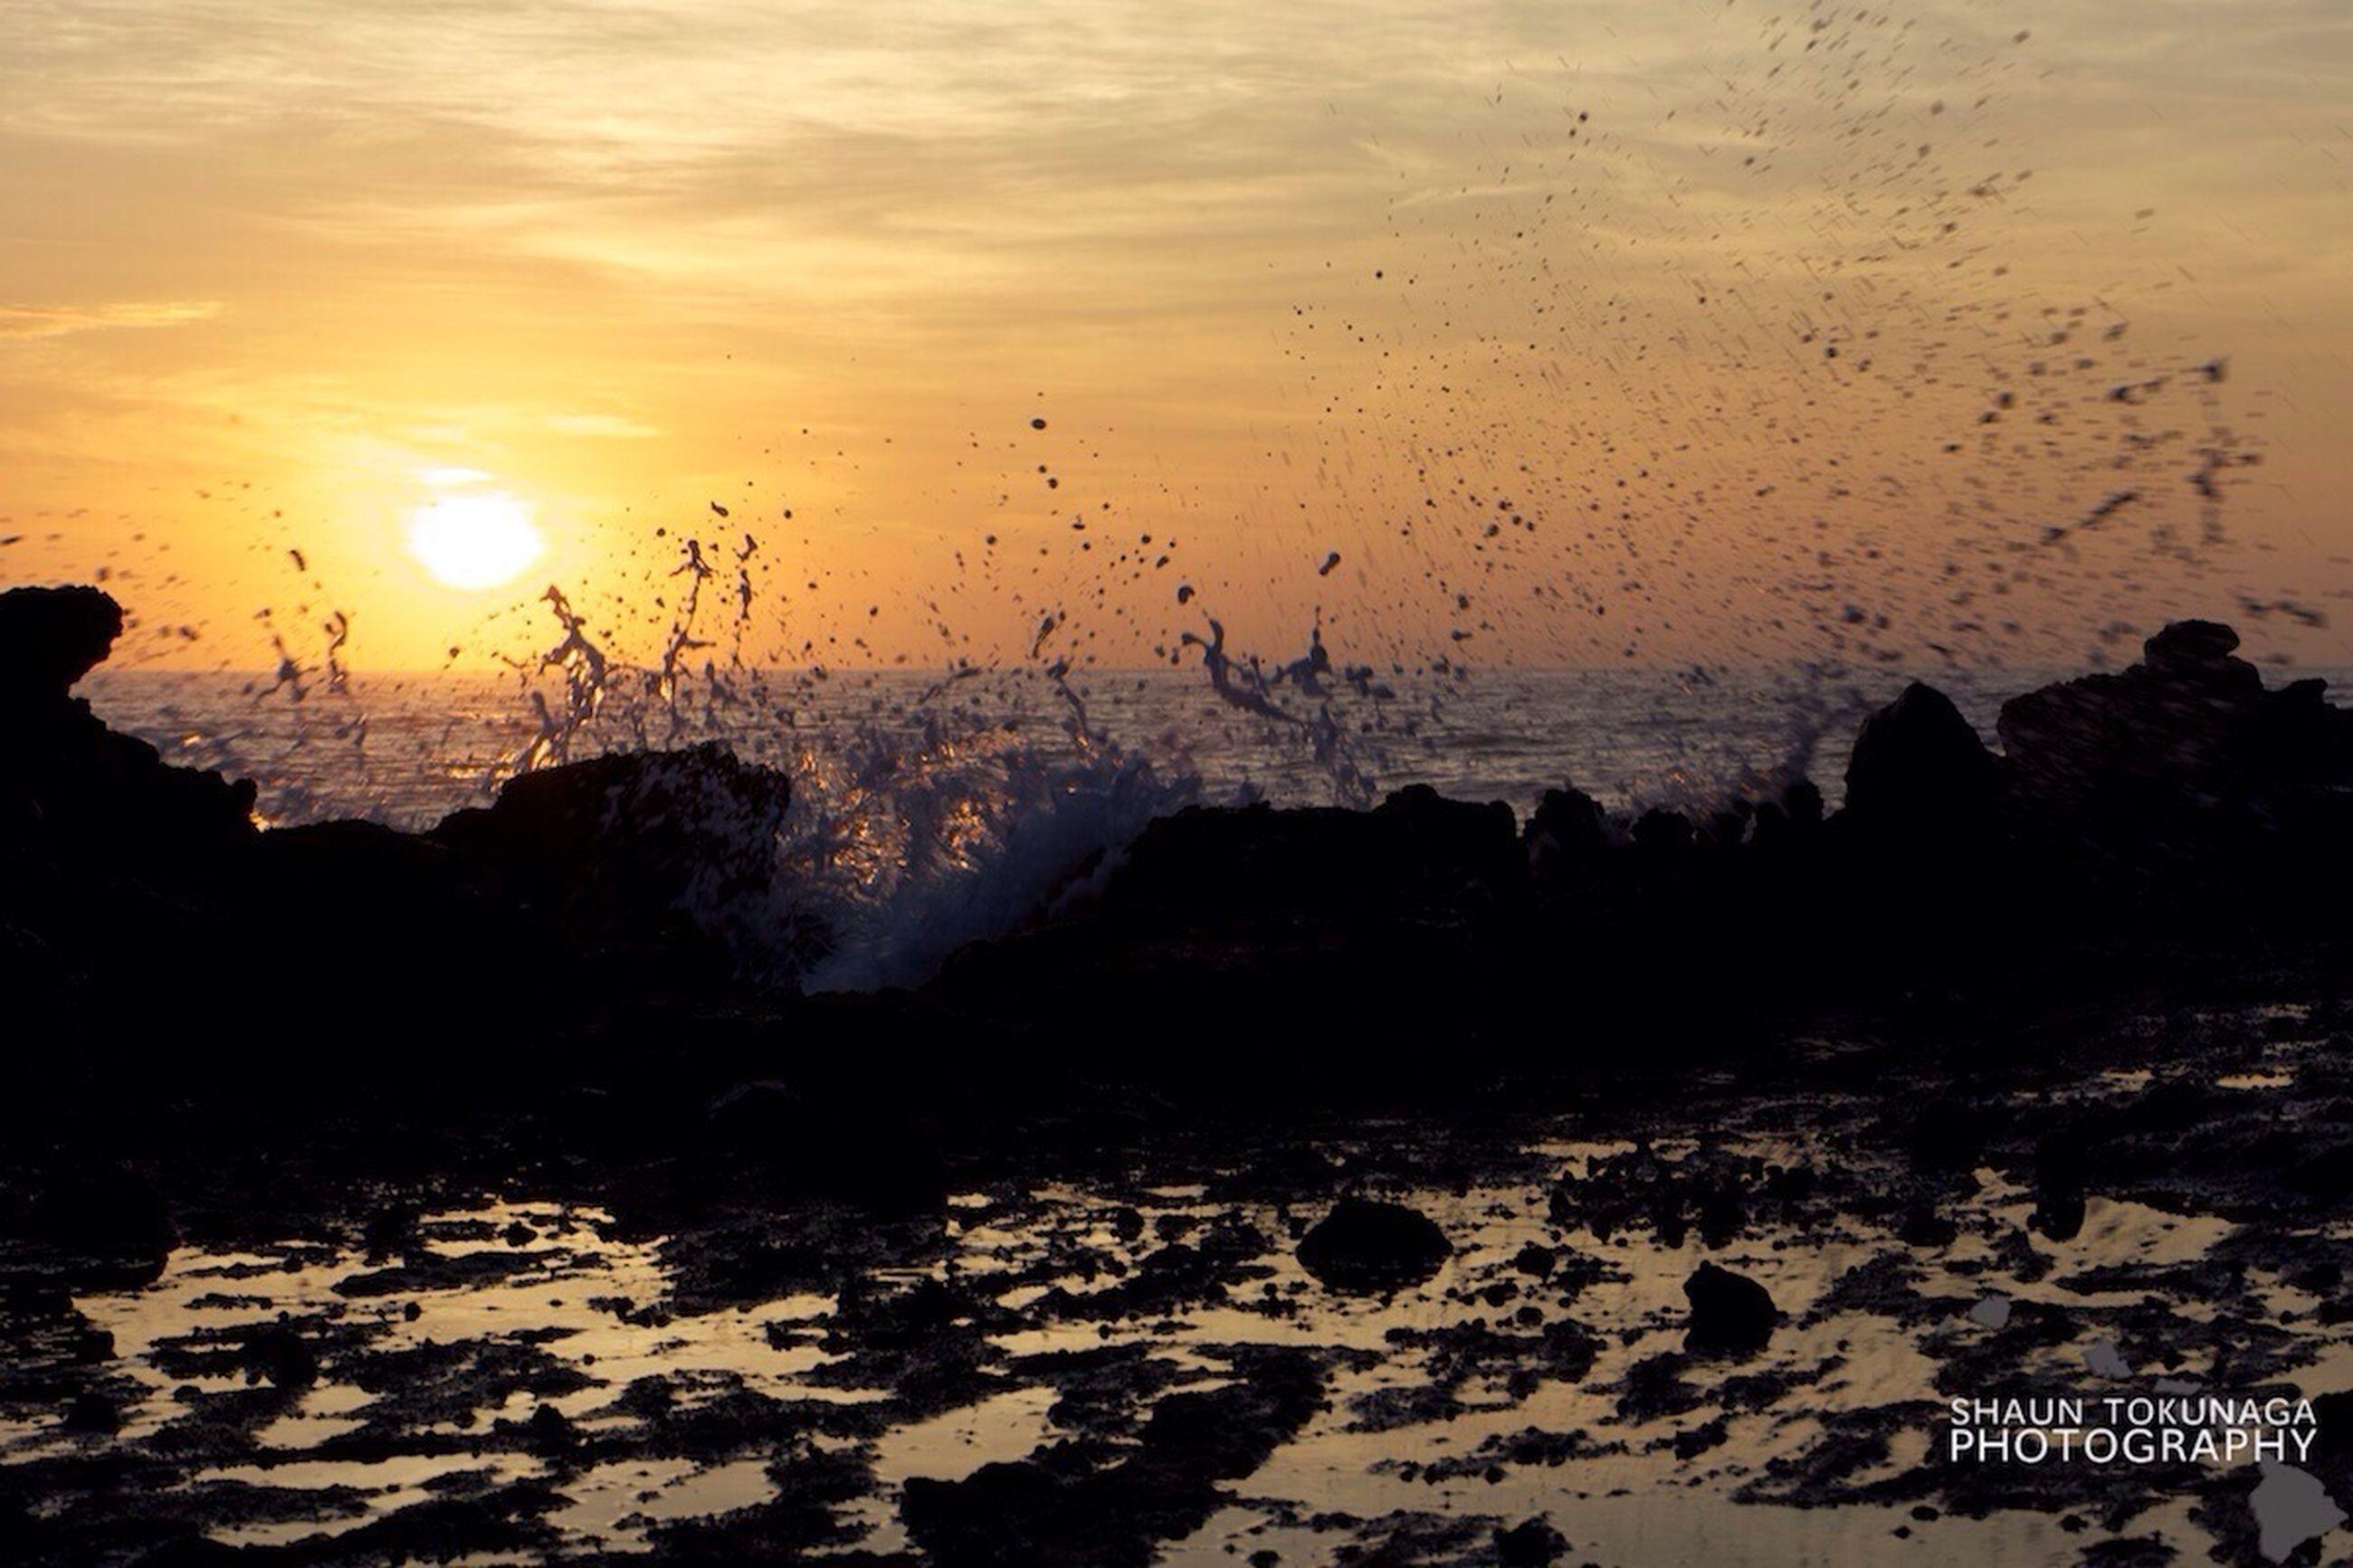 sunset, water, scenics, beauty in nature, tranquil scene, sky, sun, tranquility, nature, beach, rock - object, idyllic, sunlight, sea, outdoors, shore, sand, orange color, non-urban scene, cloud - sky